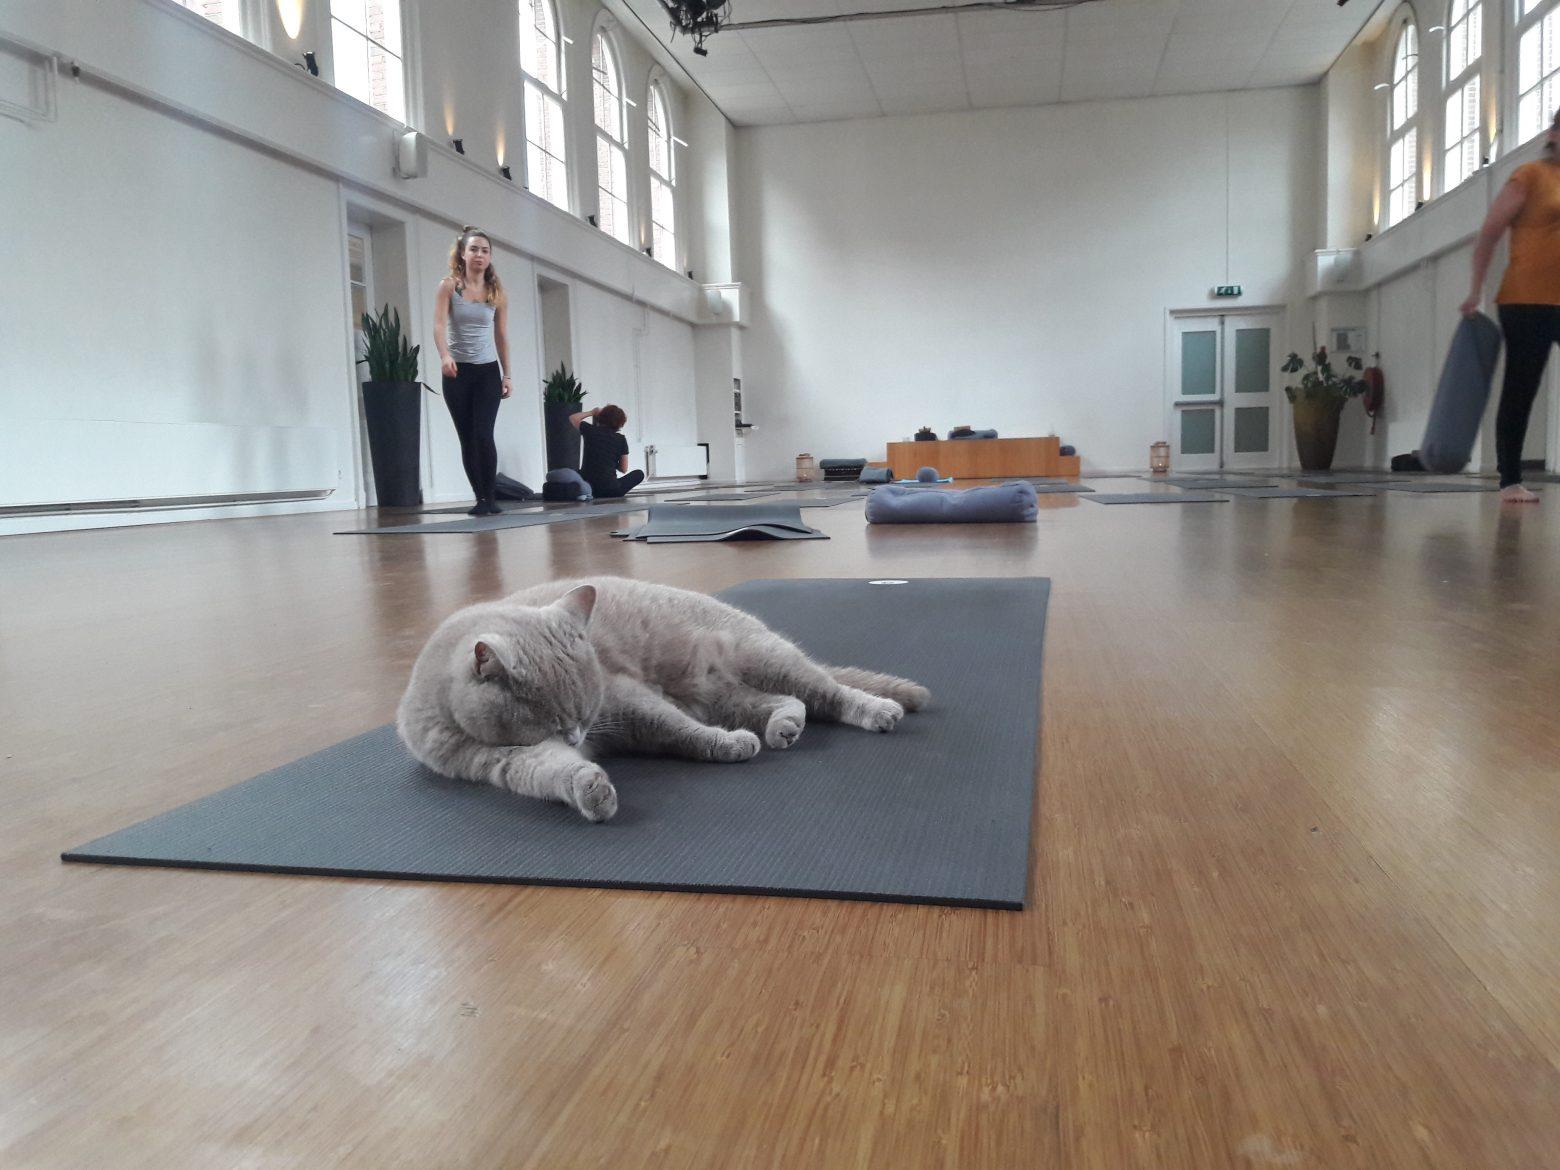 My OneFit Week- Saturday, Restorative Yoga at De Nieuwe Yogaschool